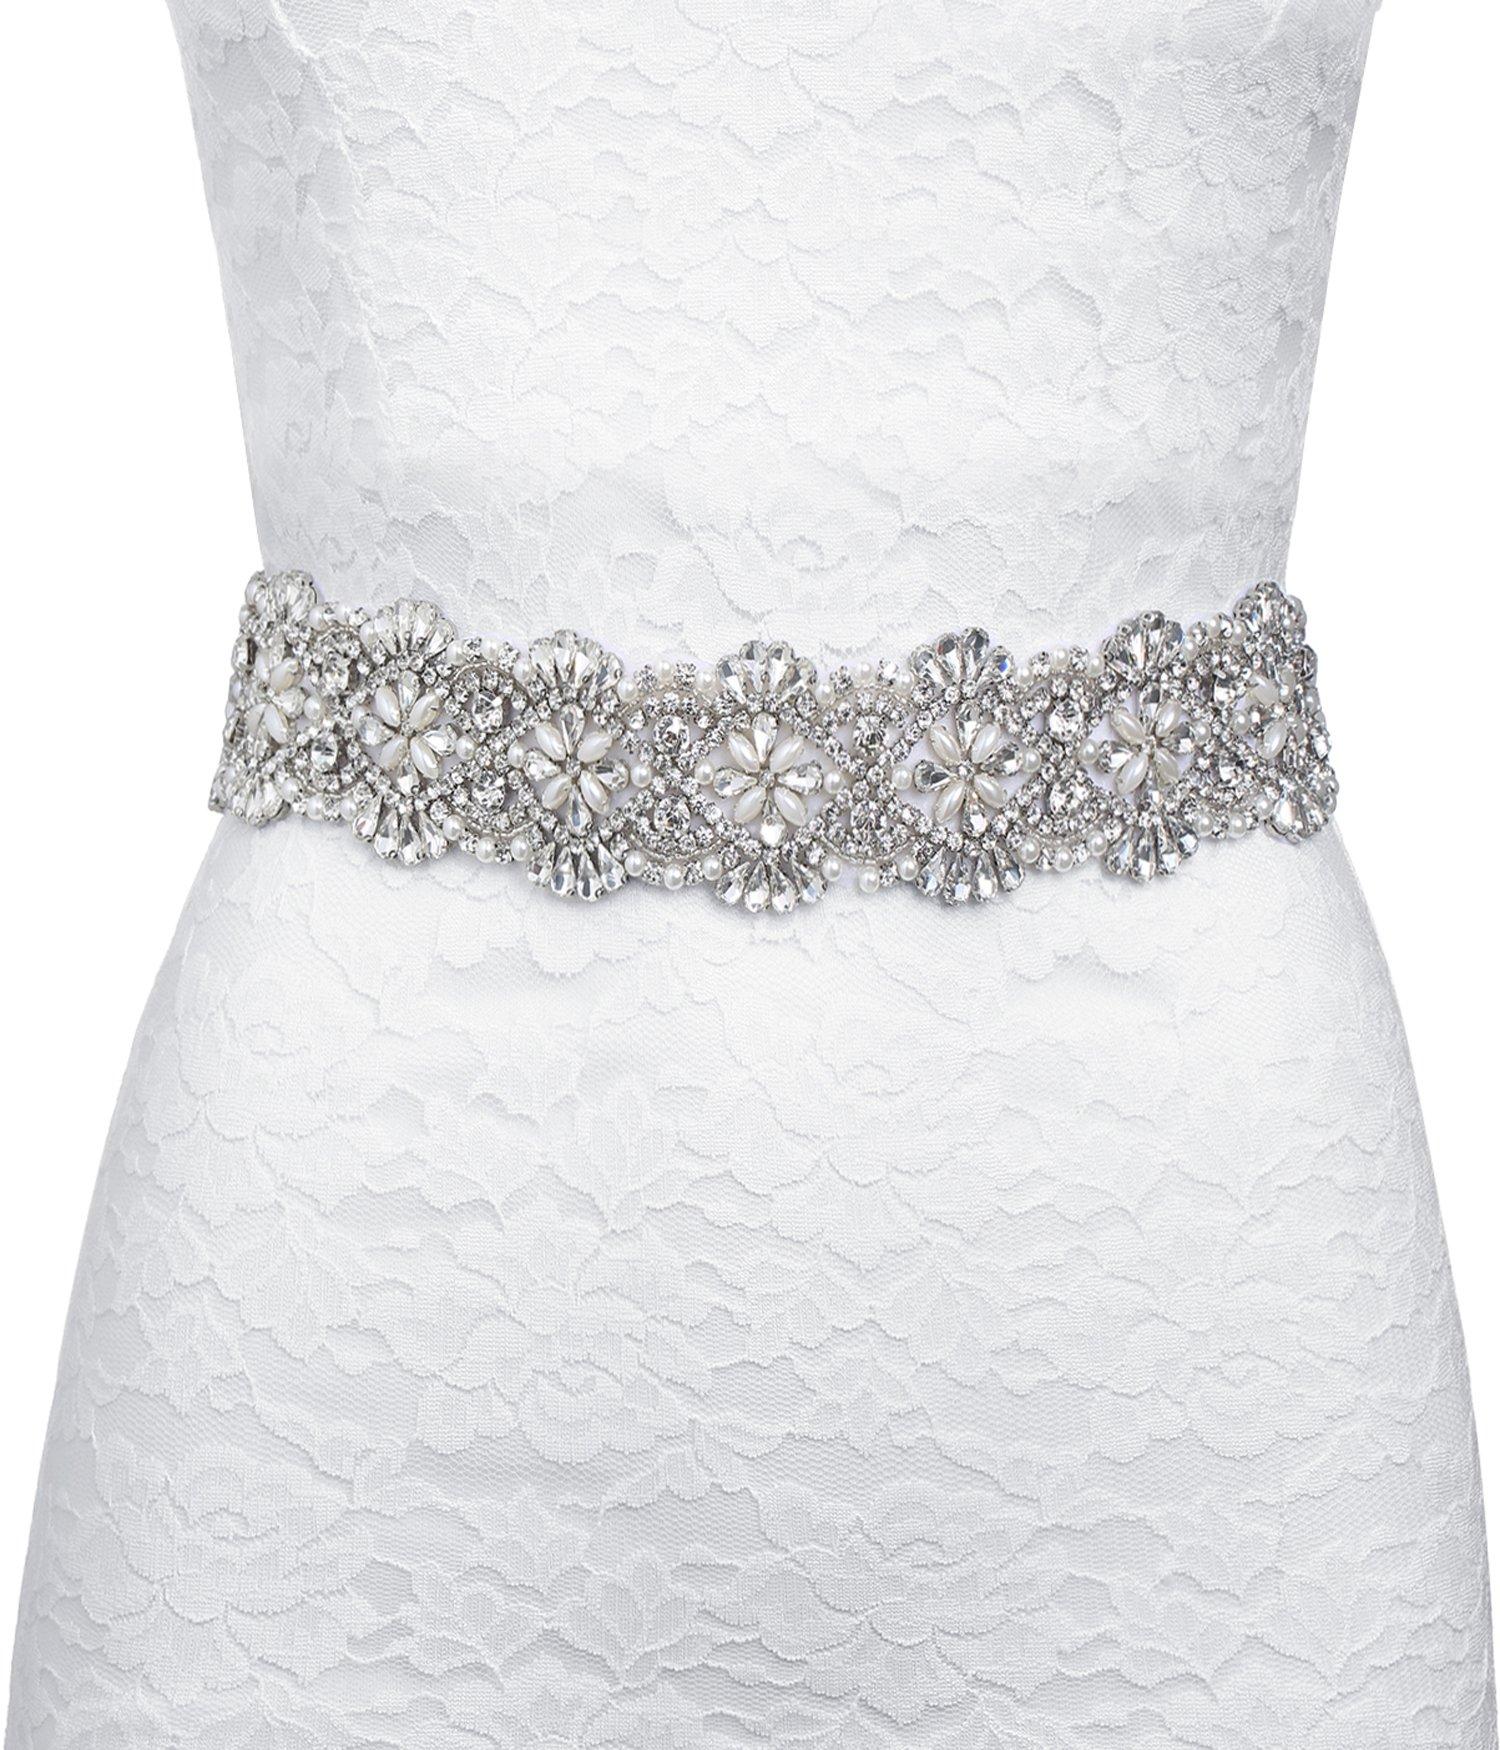 BABEYOND Wedding Sash Beaded Sash Belt Applique for Wedding Evening Dresses by BABEYOND